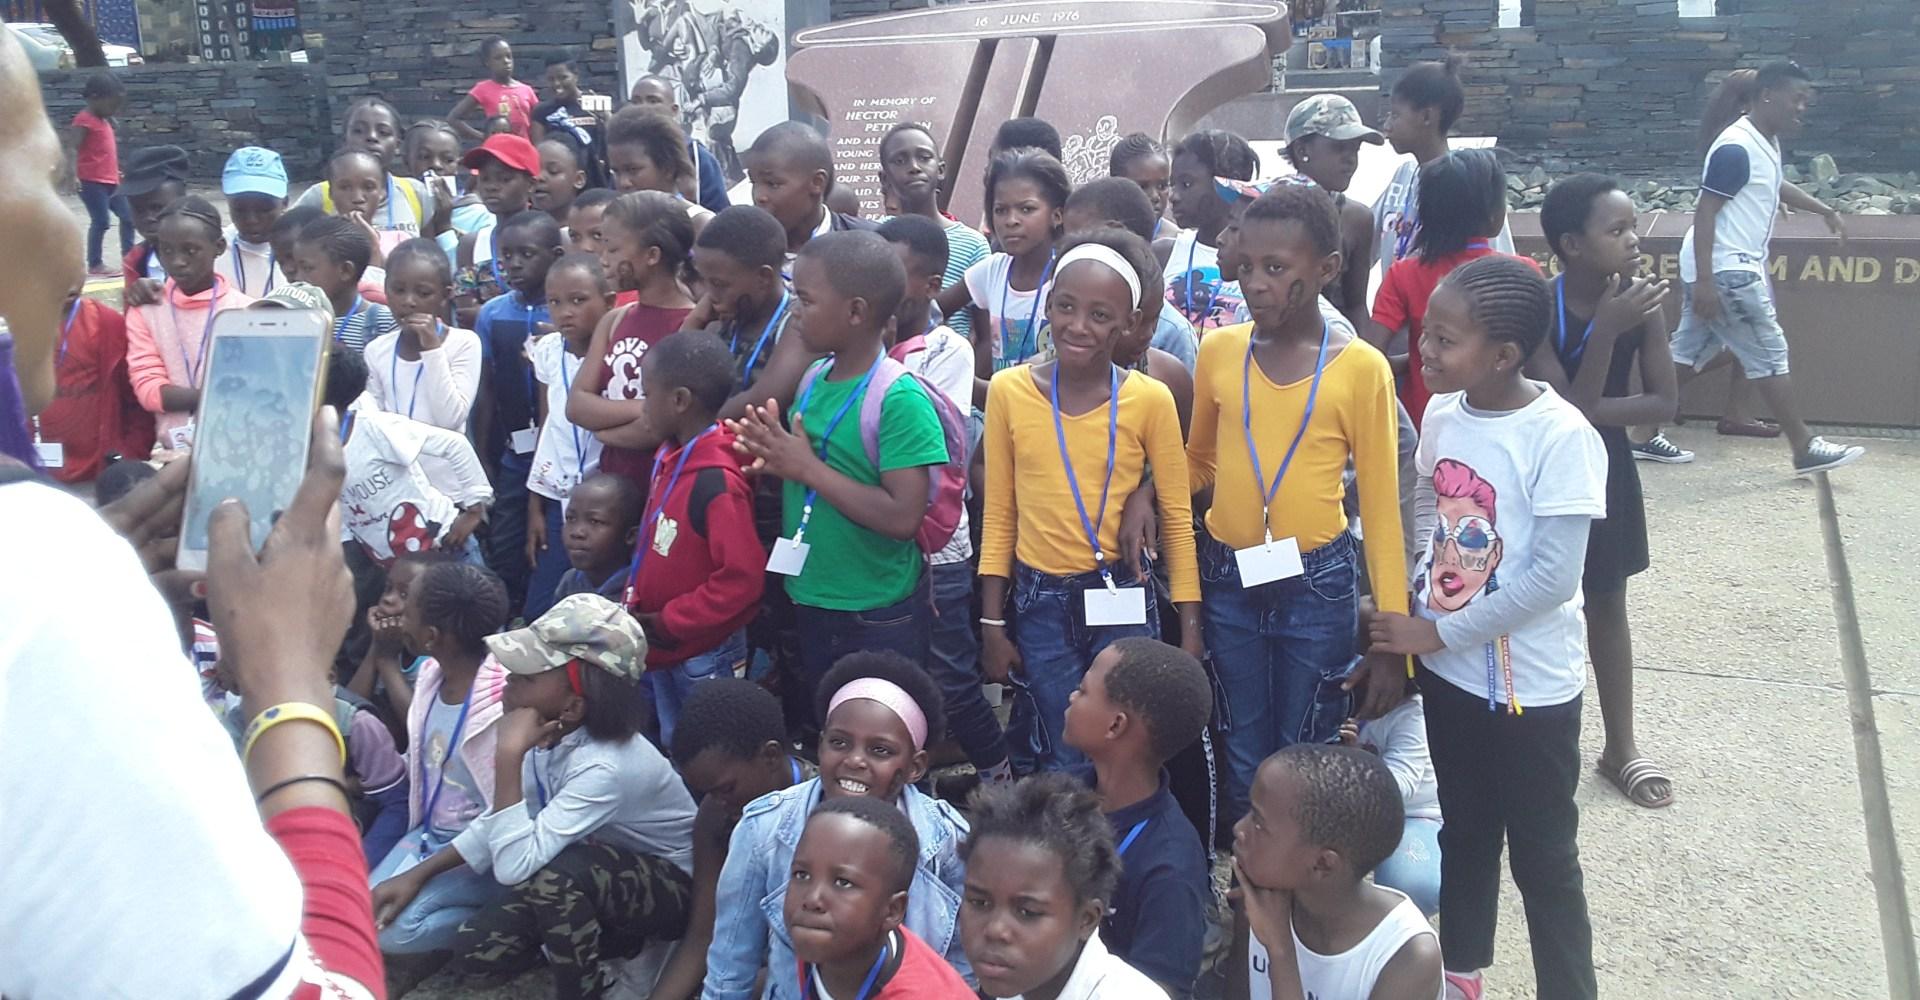 Soweto Sightseeing Tour 2019